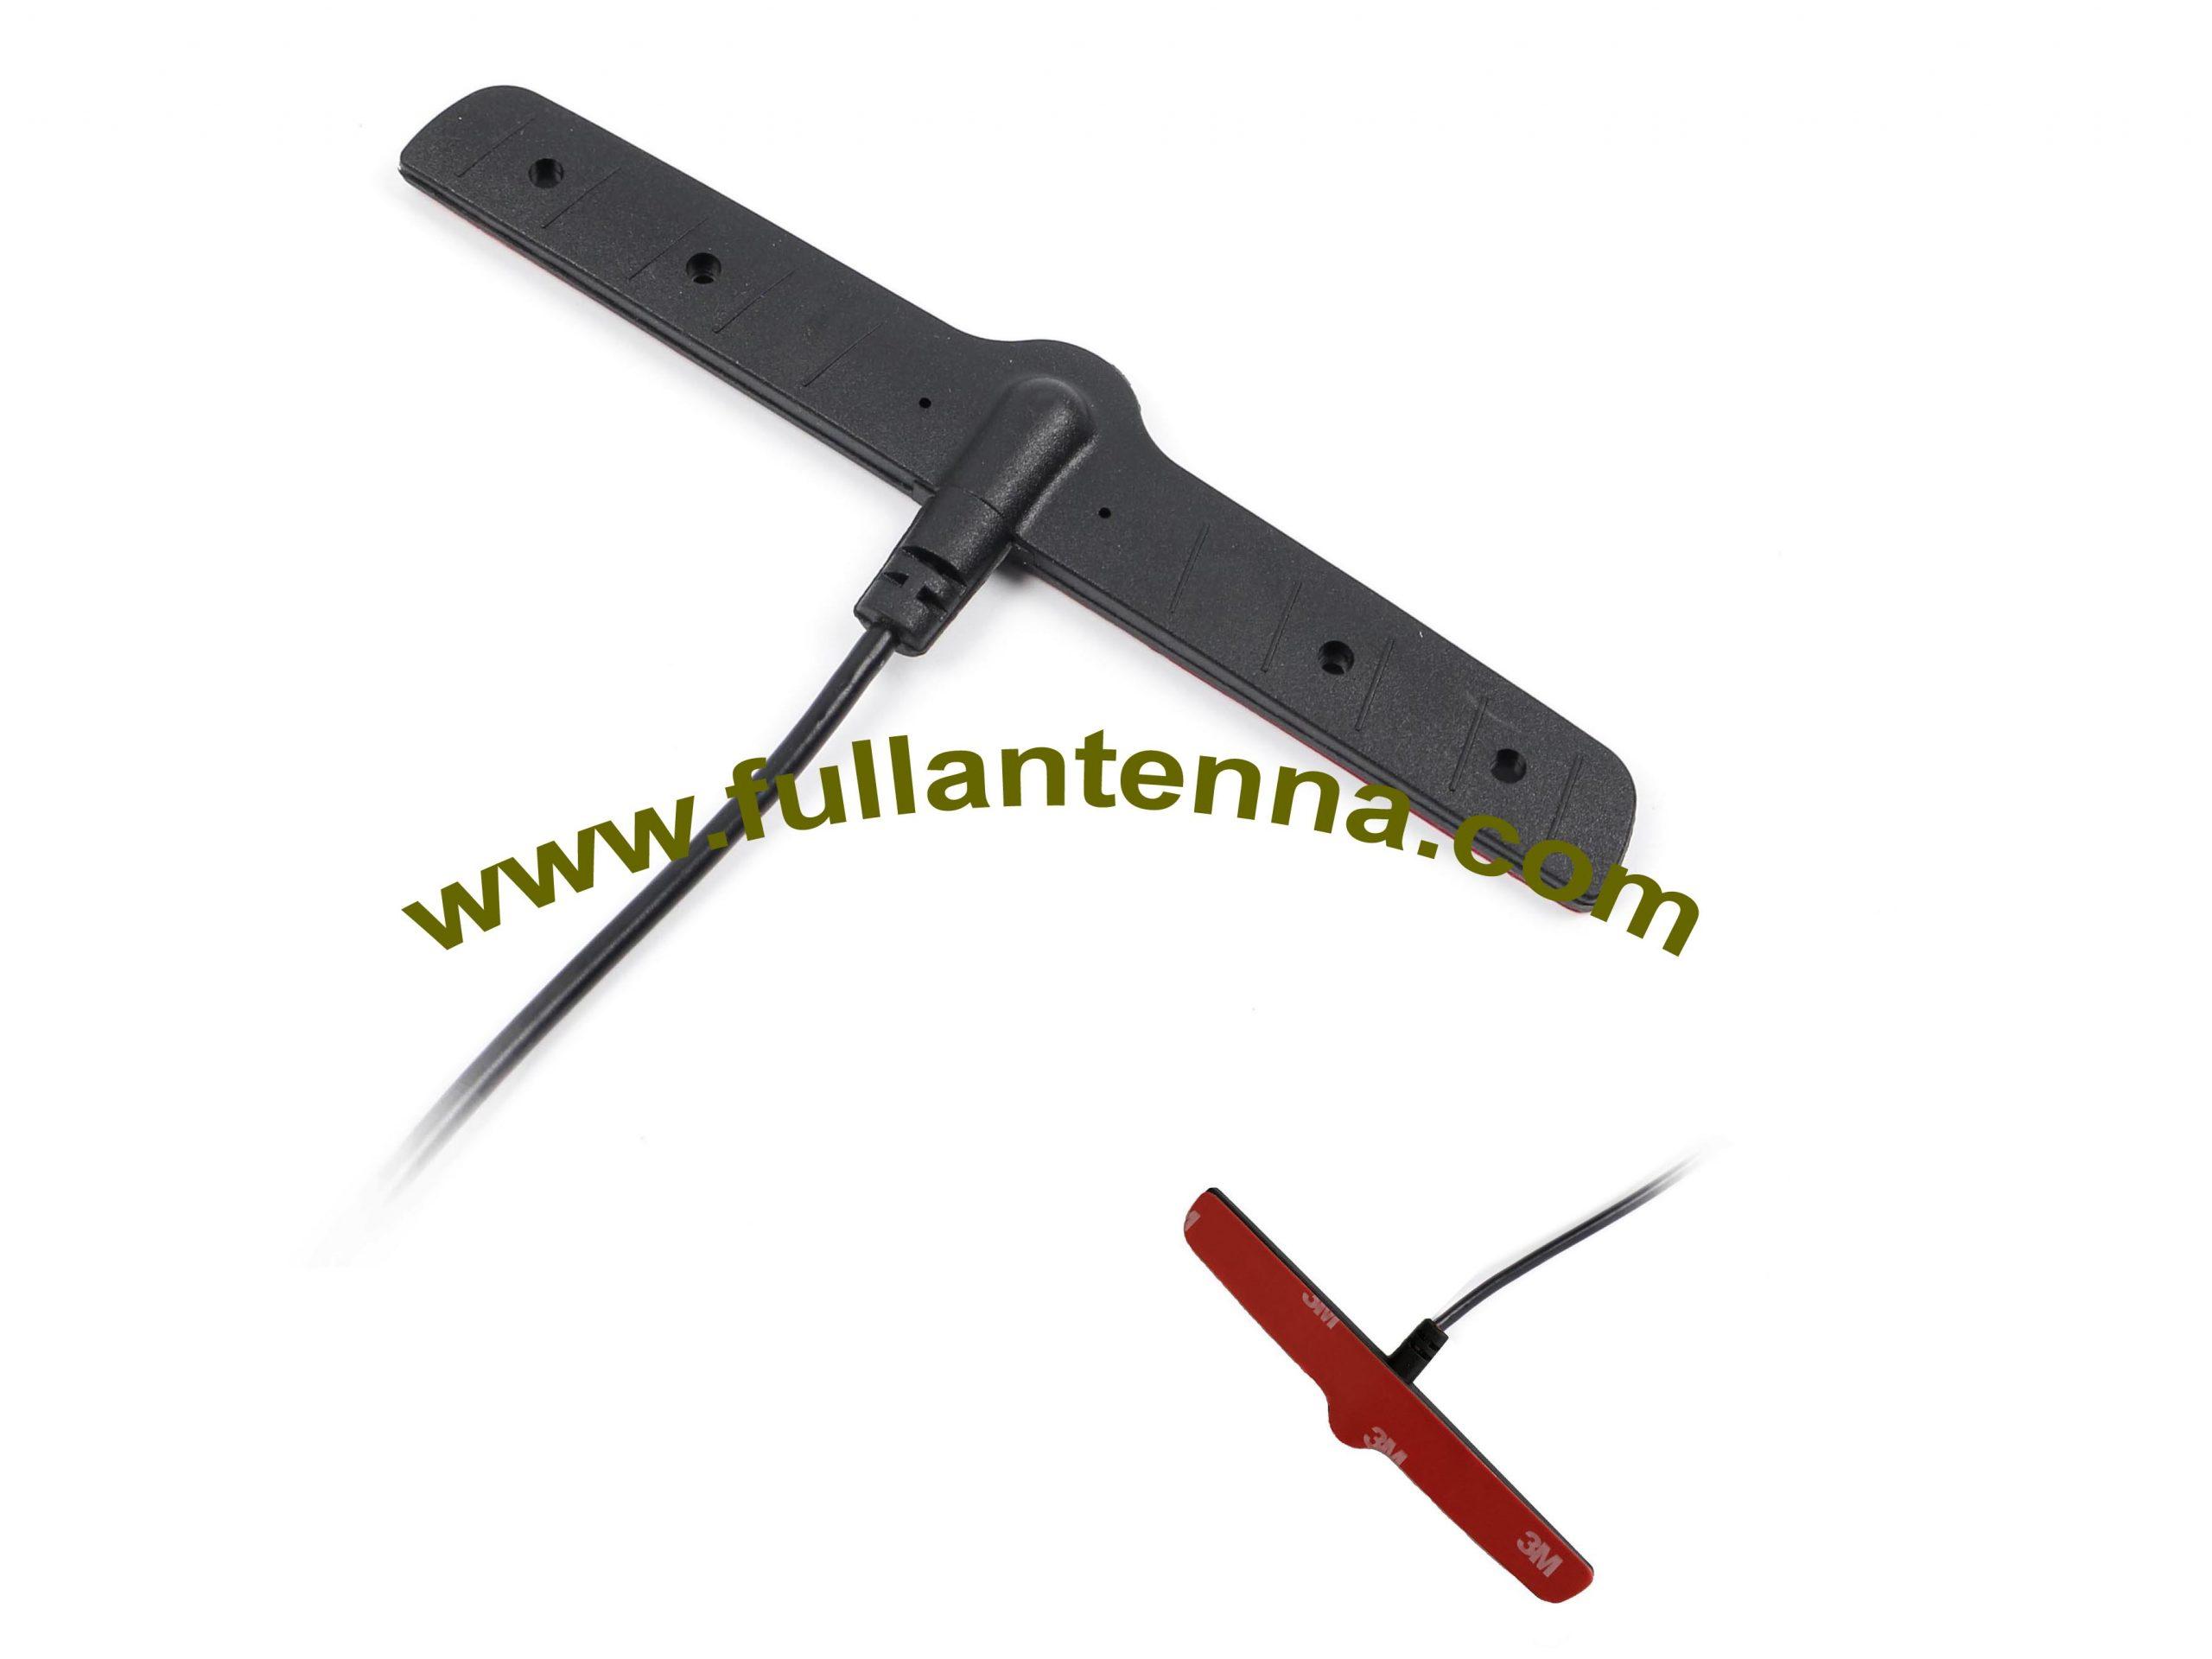 P/N:FA868.0501,868Mhz Antenna,T shape  adhesive mount 868mhz indoor antenna  3M sticker